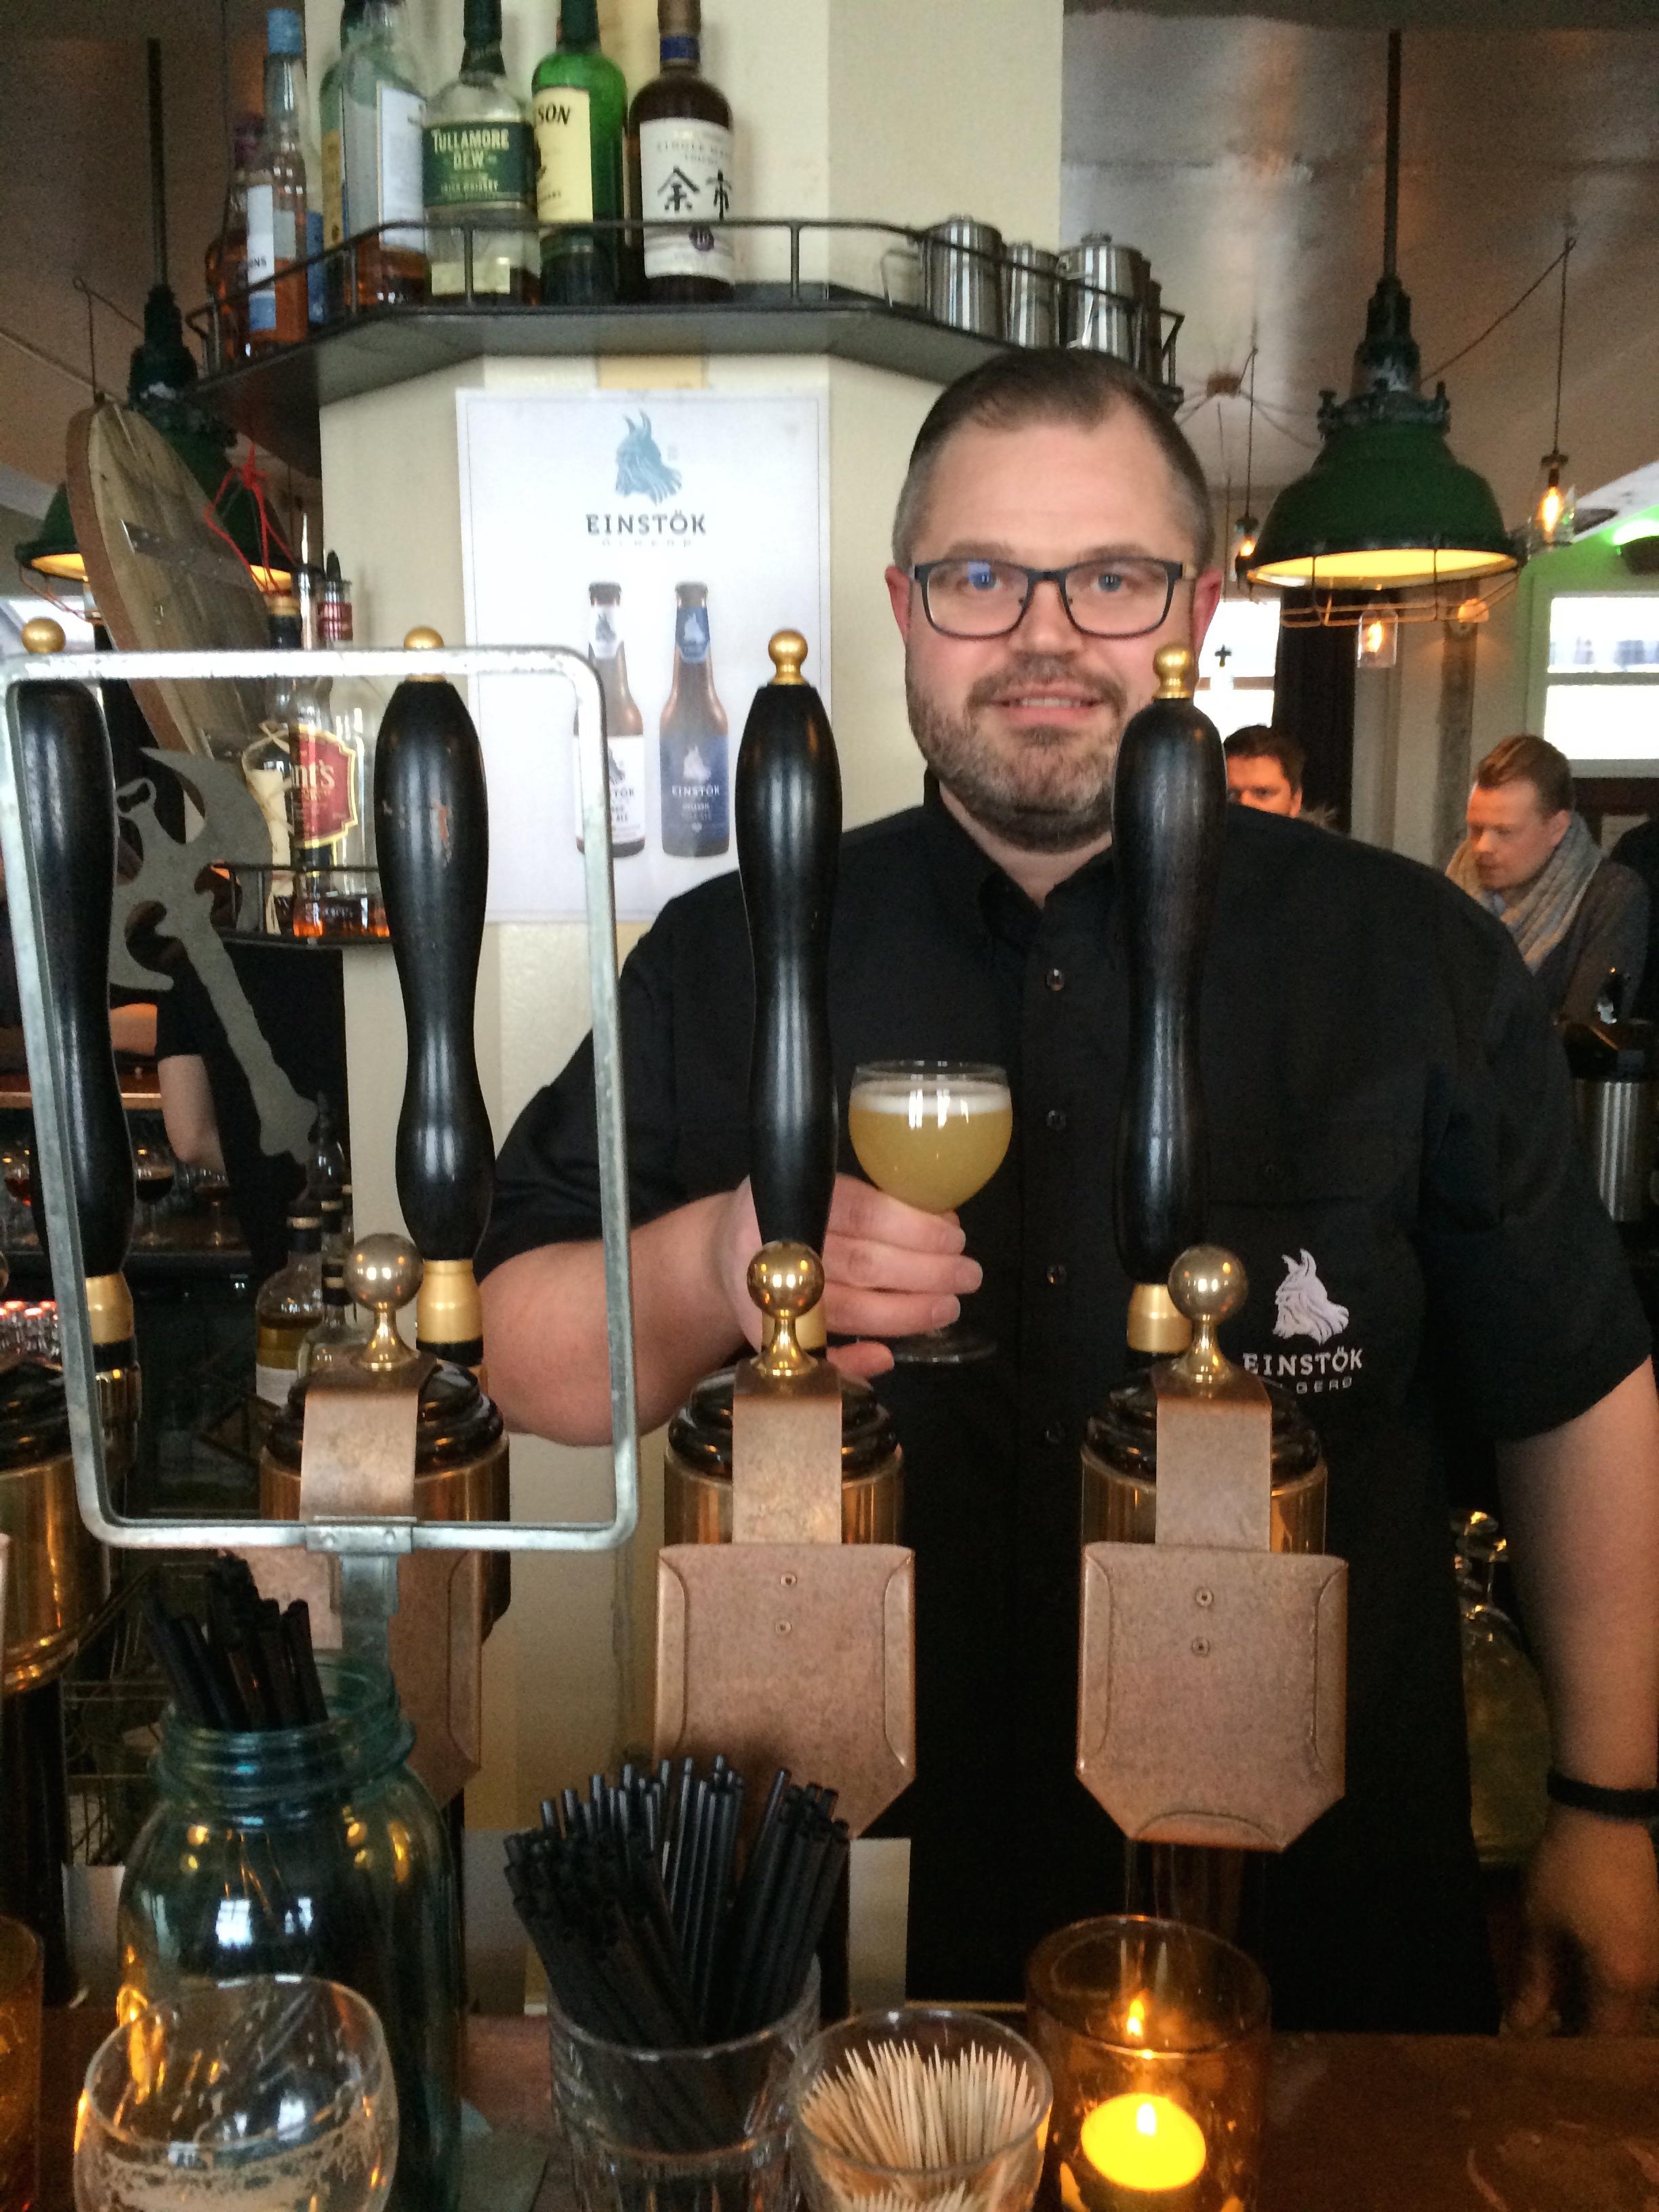 Einstok Brewery serving Icelandic White Ale at Icelandic Beer Fest